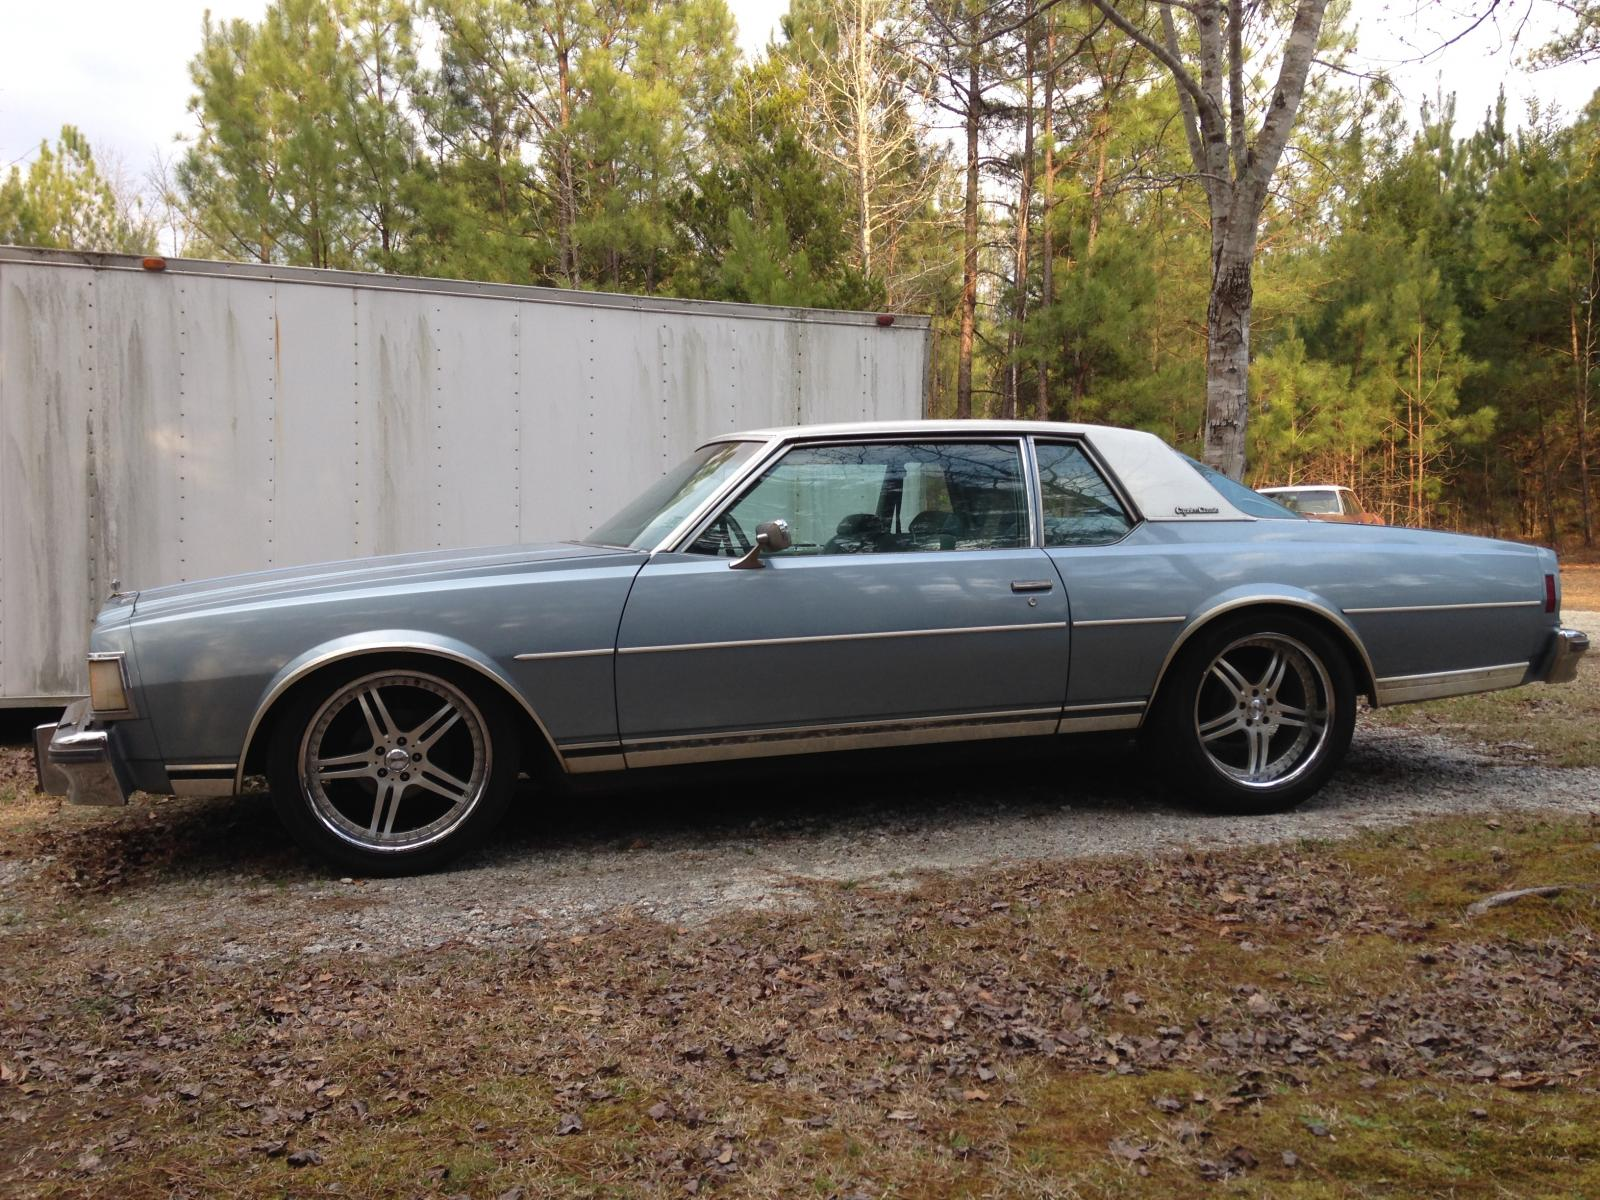 1977 Caprice/Impala - Page 3